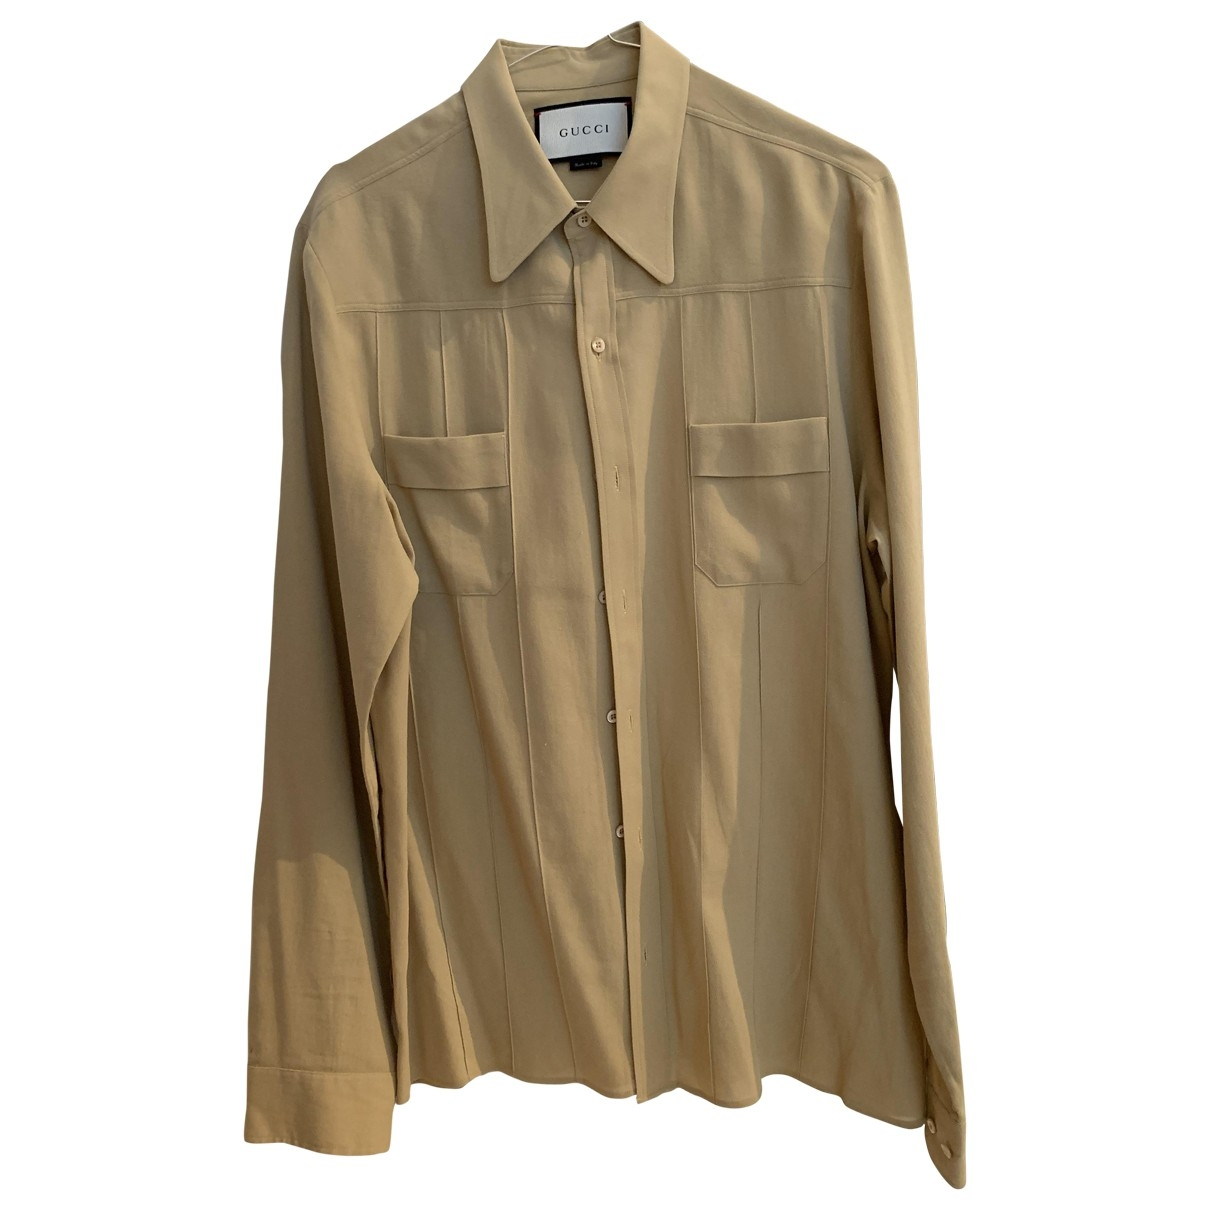 Gucci \N Beige Shirts for Men S International